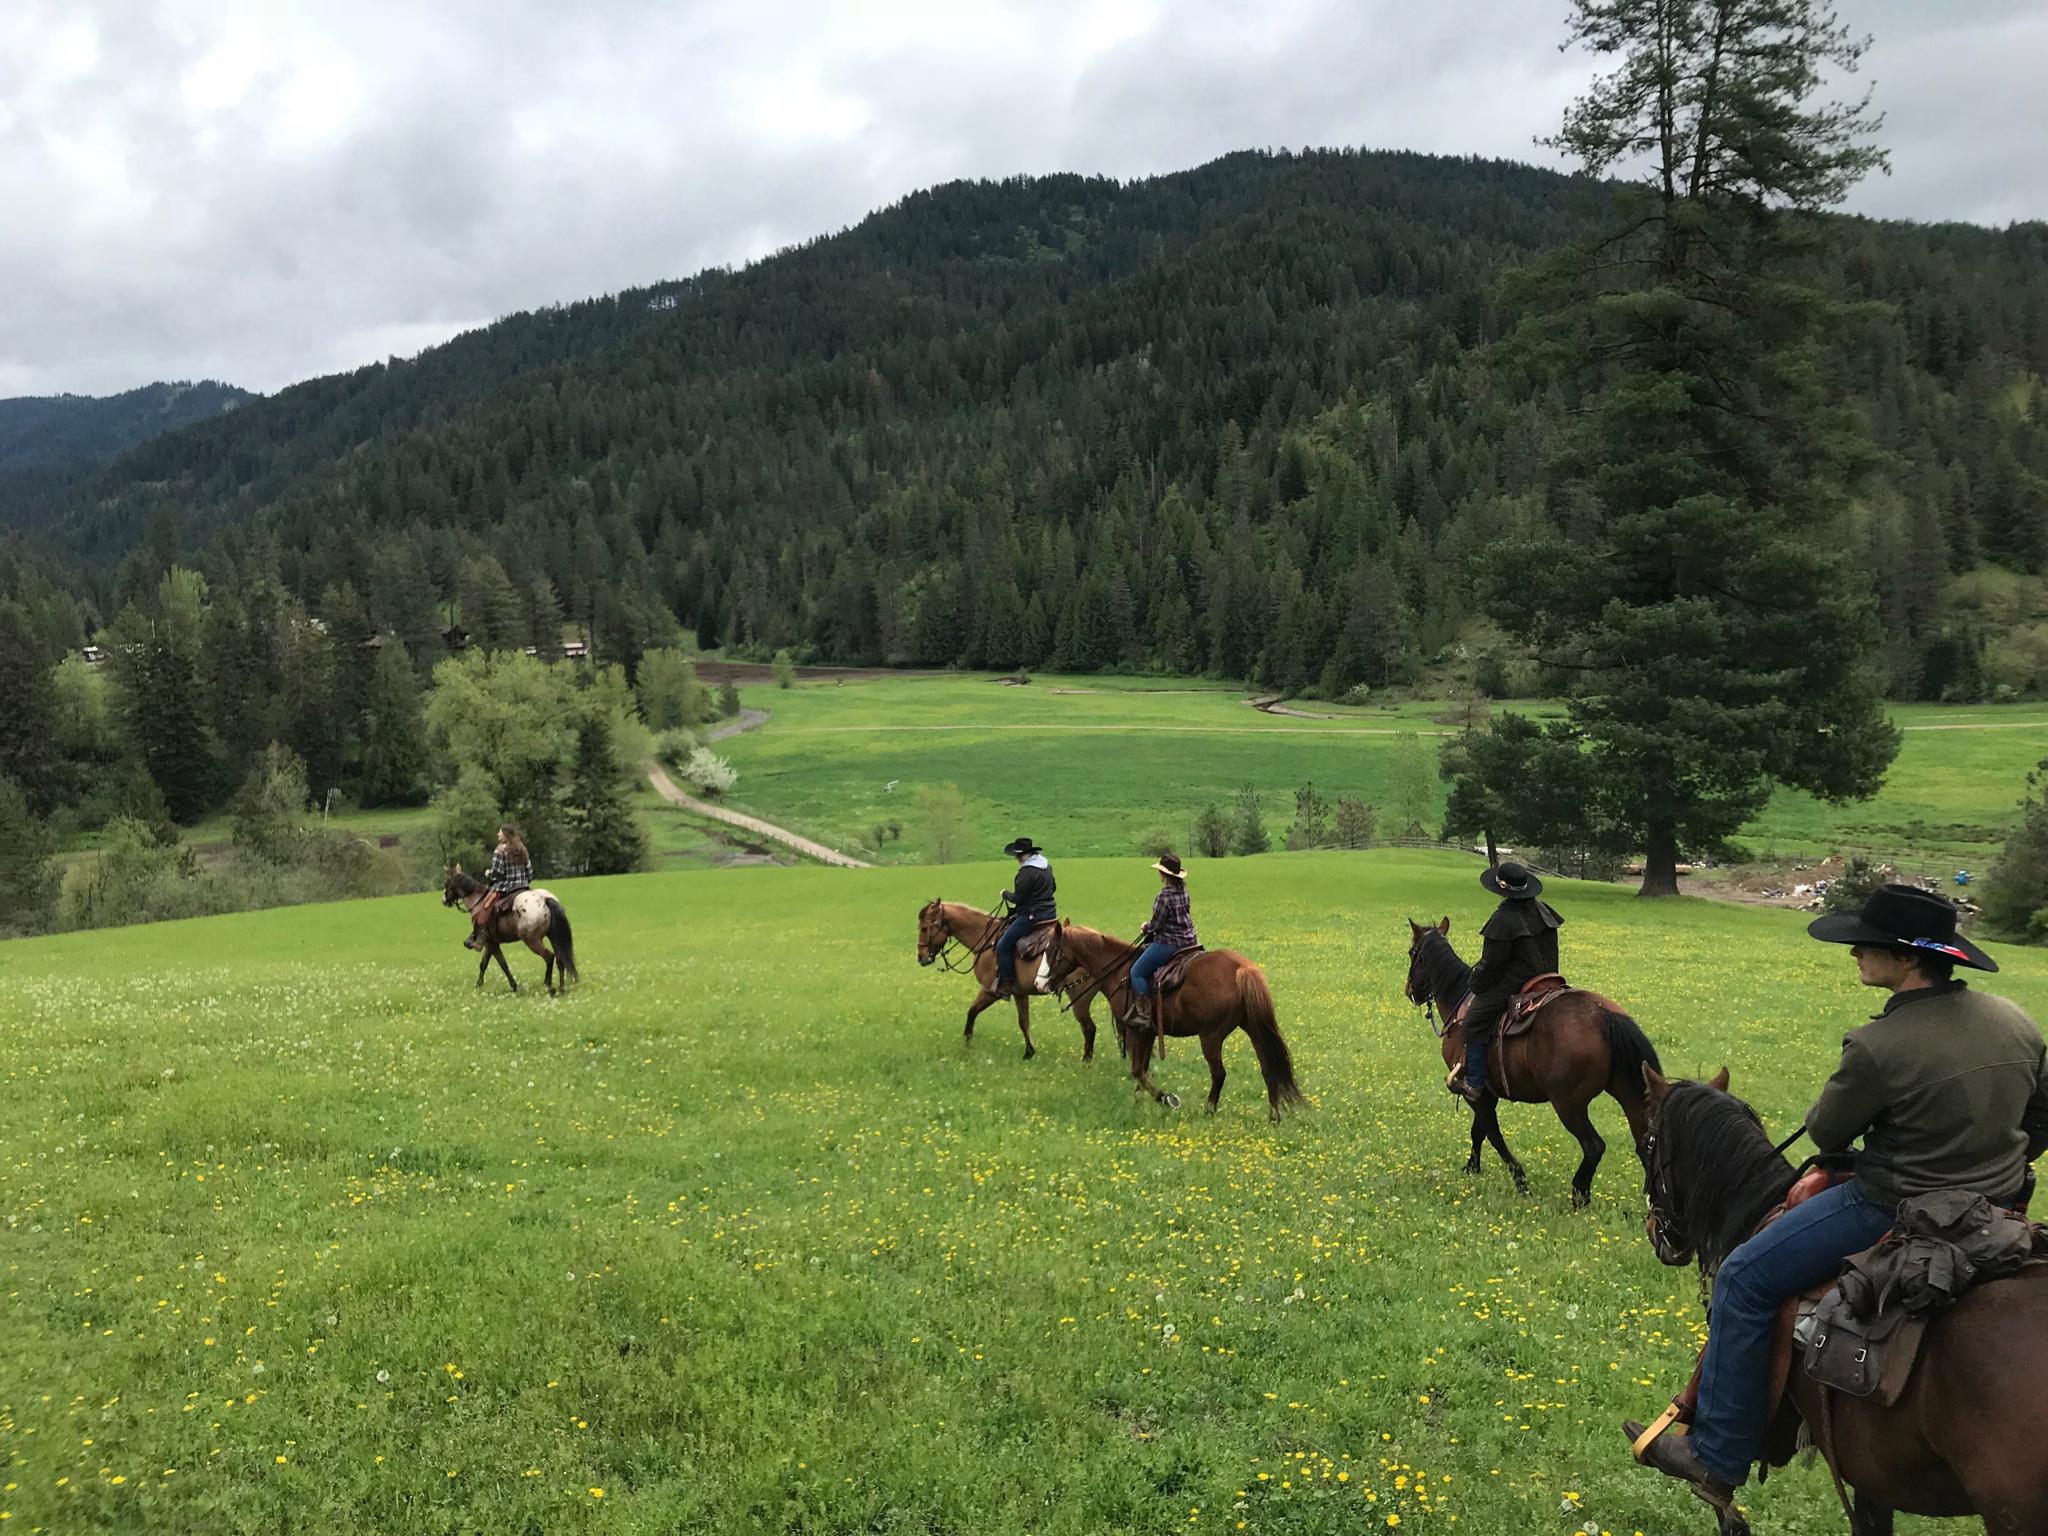 Group in a field on horseback.